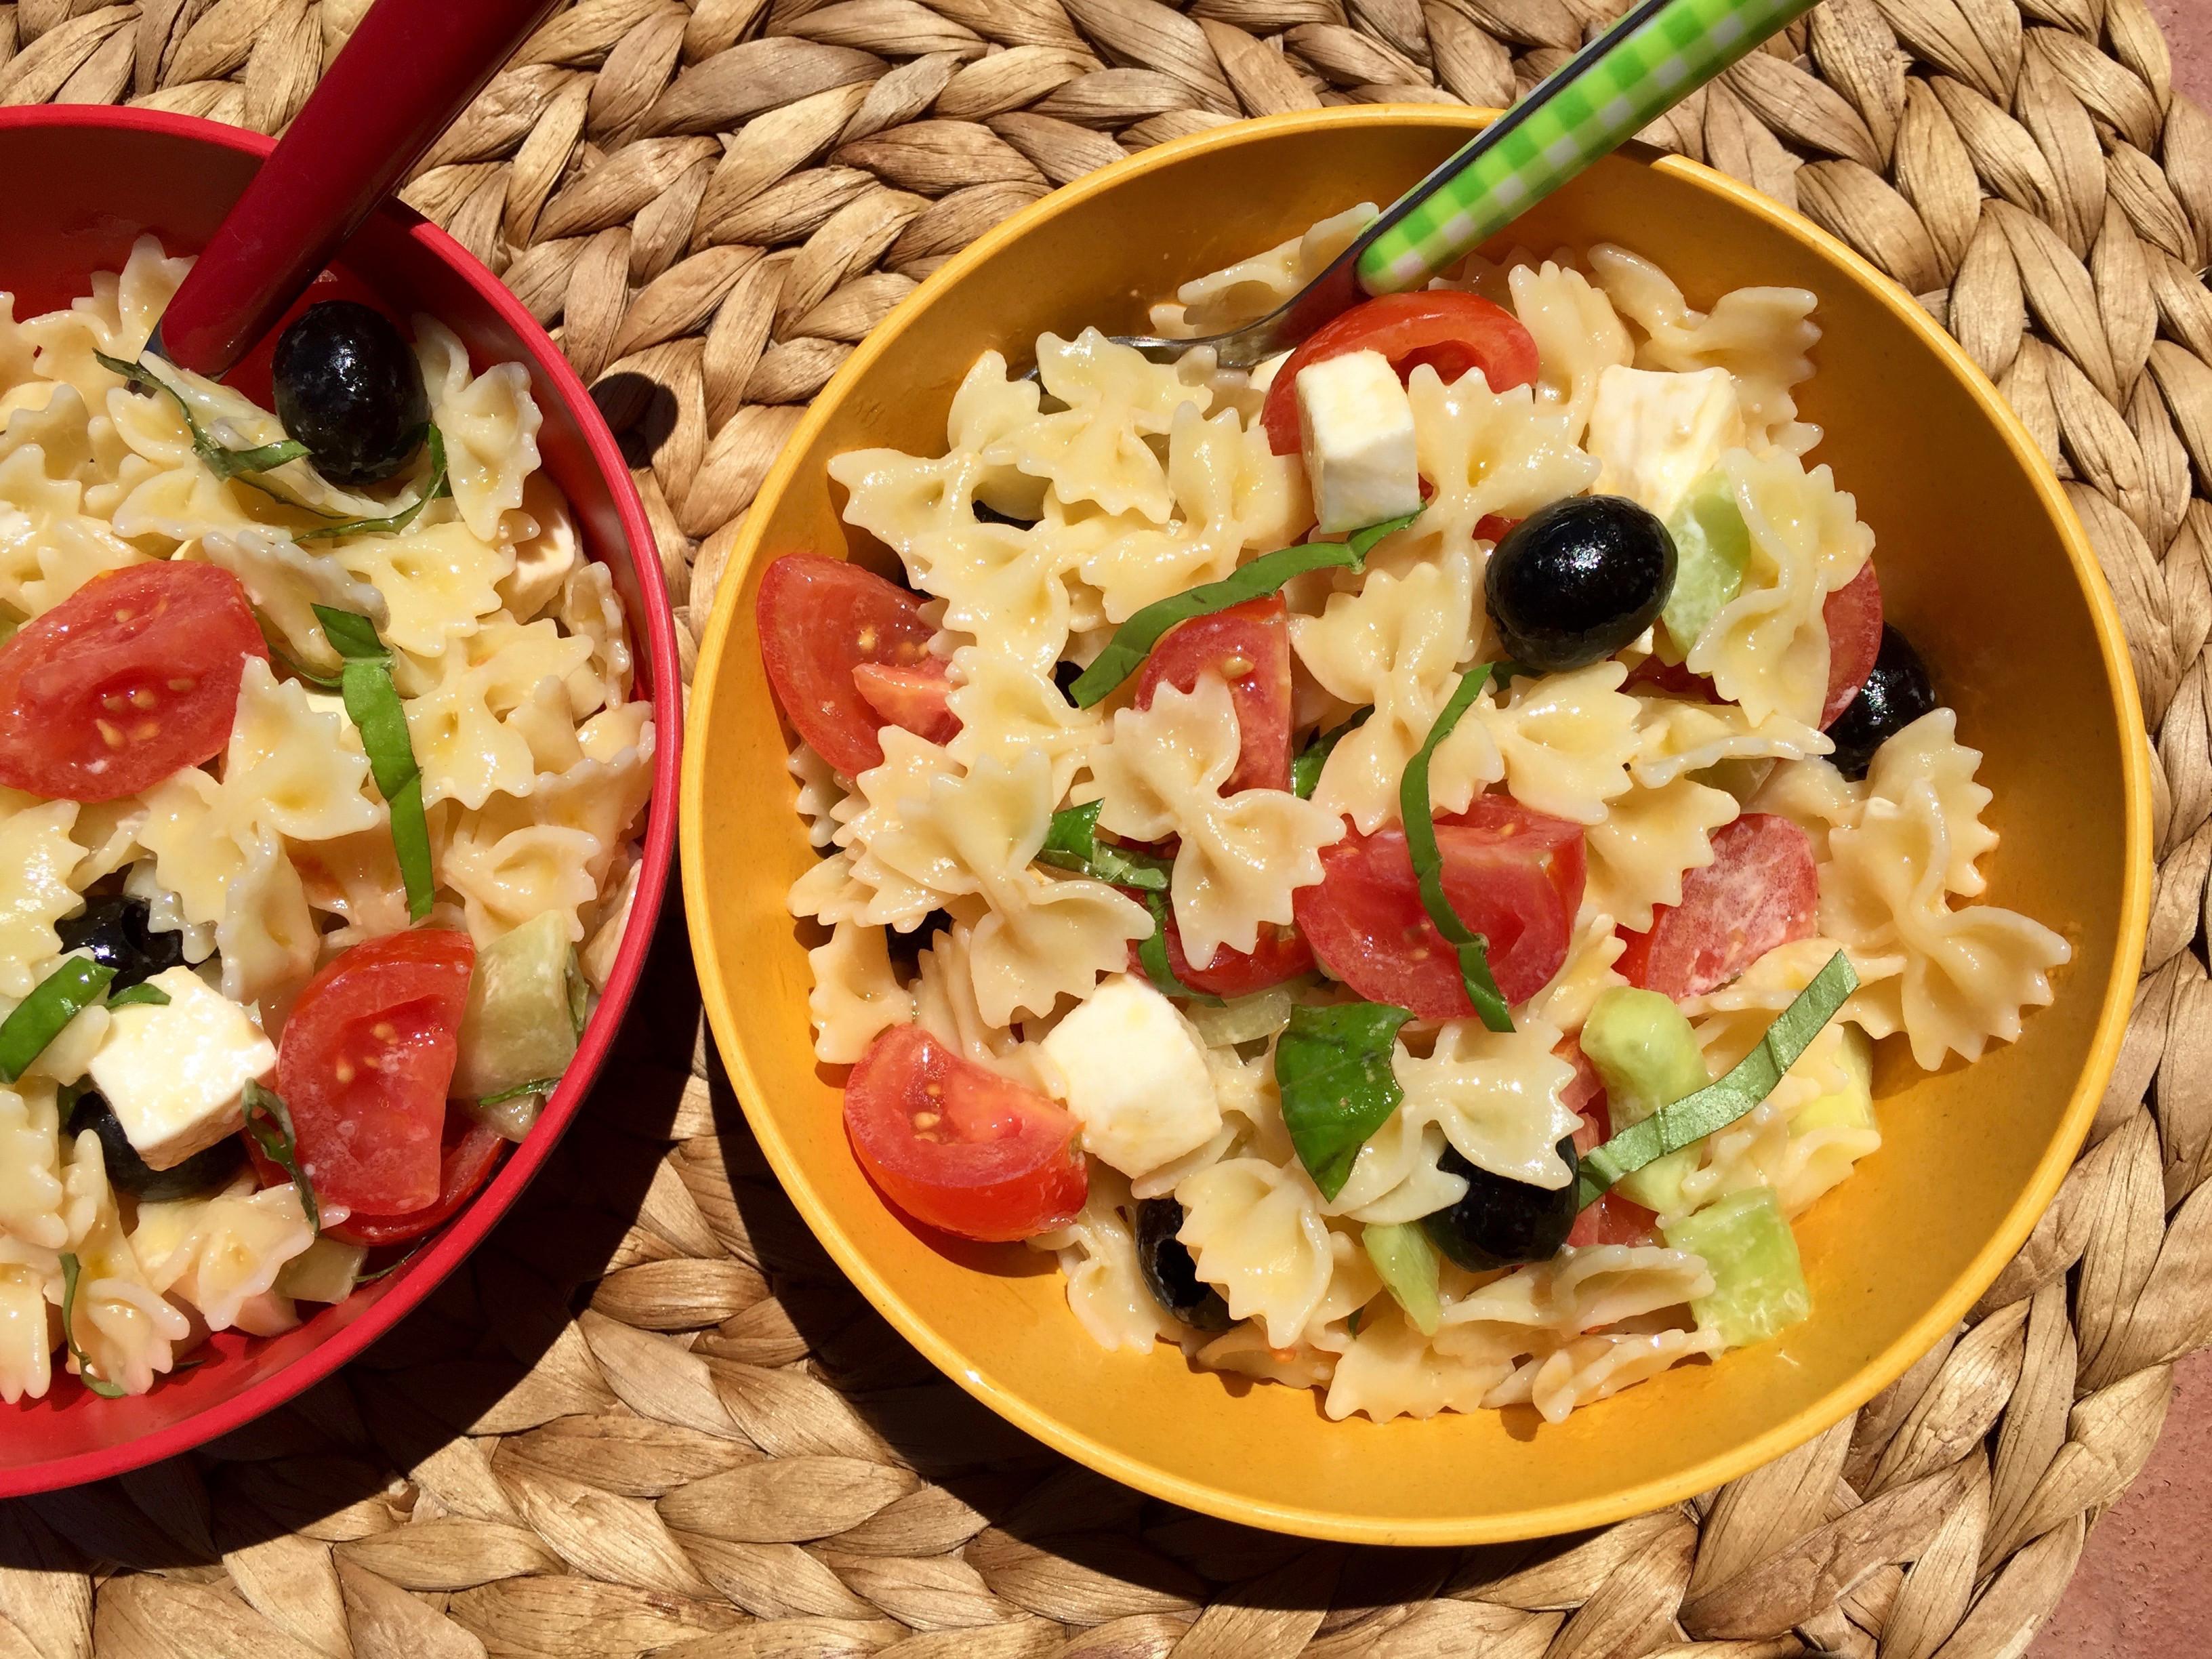 Summertime Pasta Salad  Healthy Summer Pasta Salad Bites for Foo s